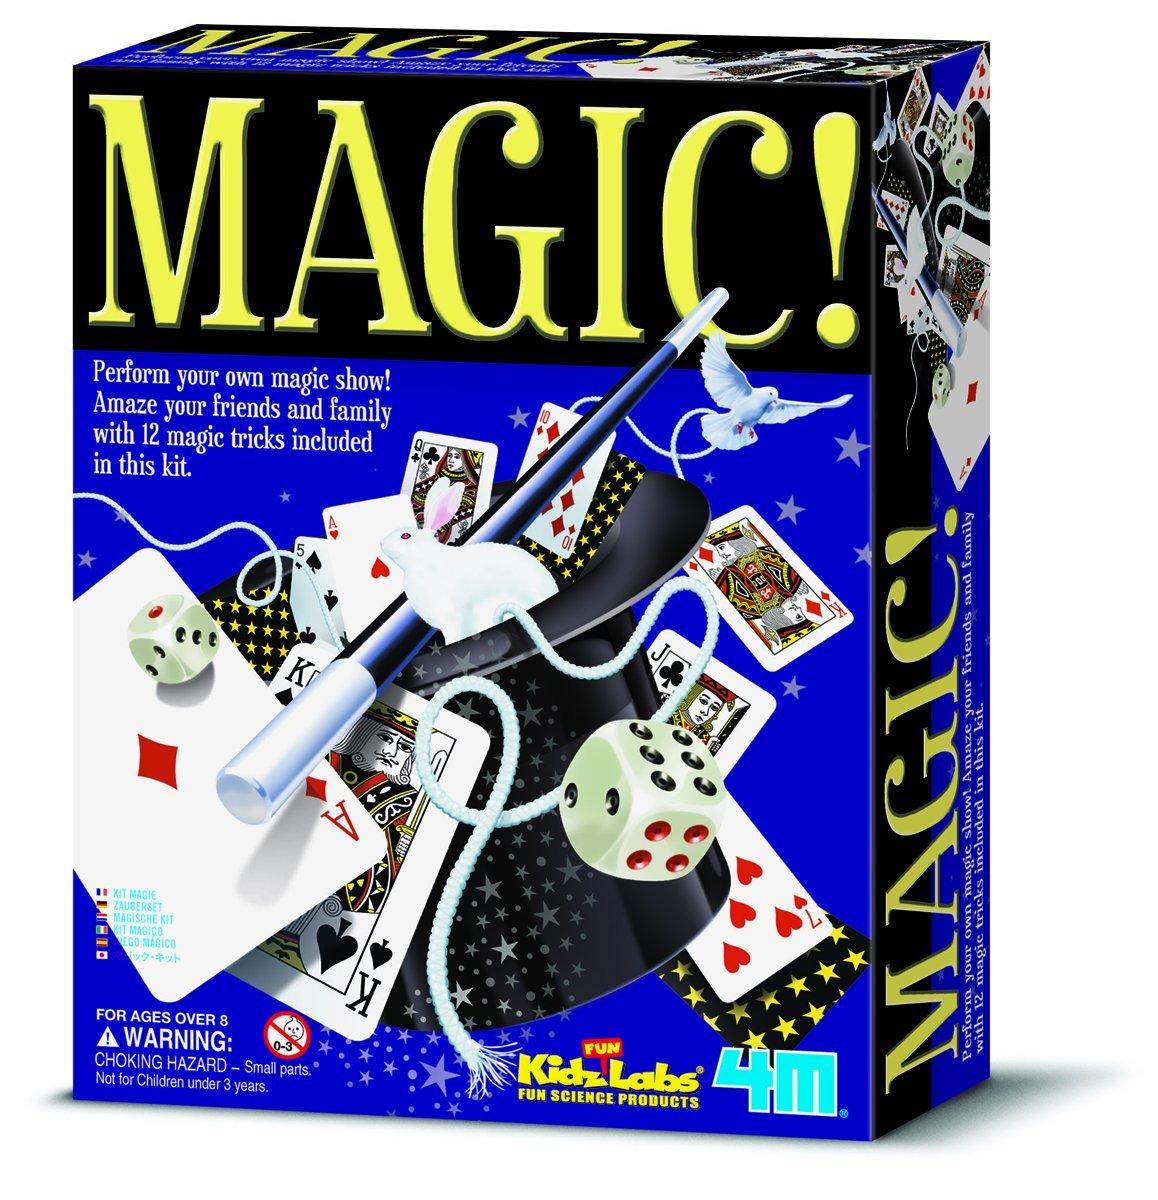 Kidz Labs Magic Set with 12 Tricks